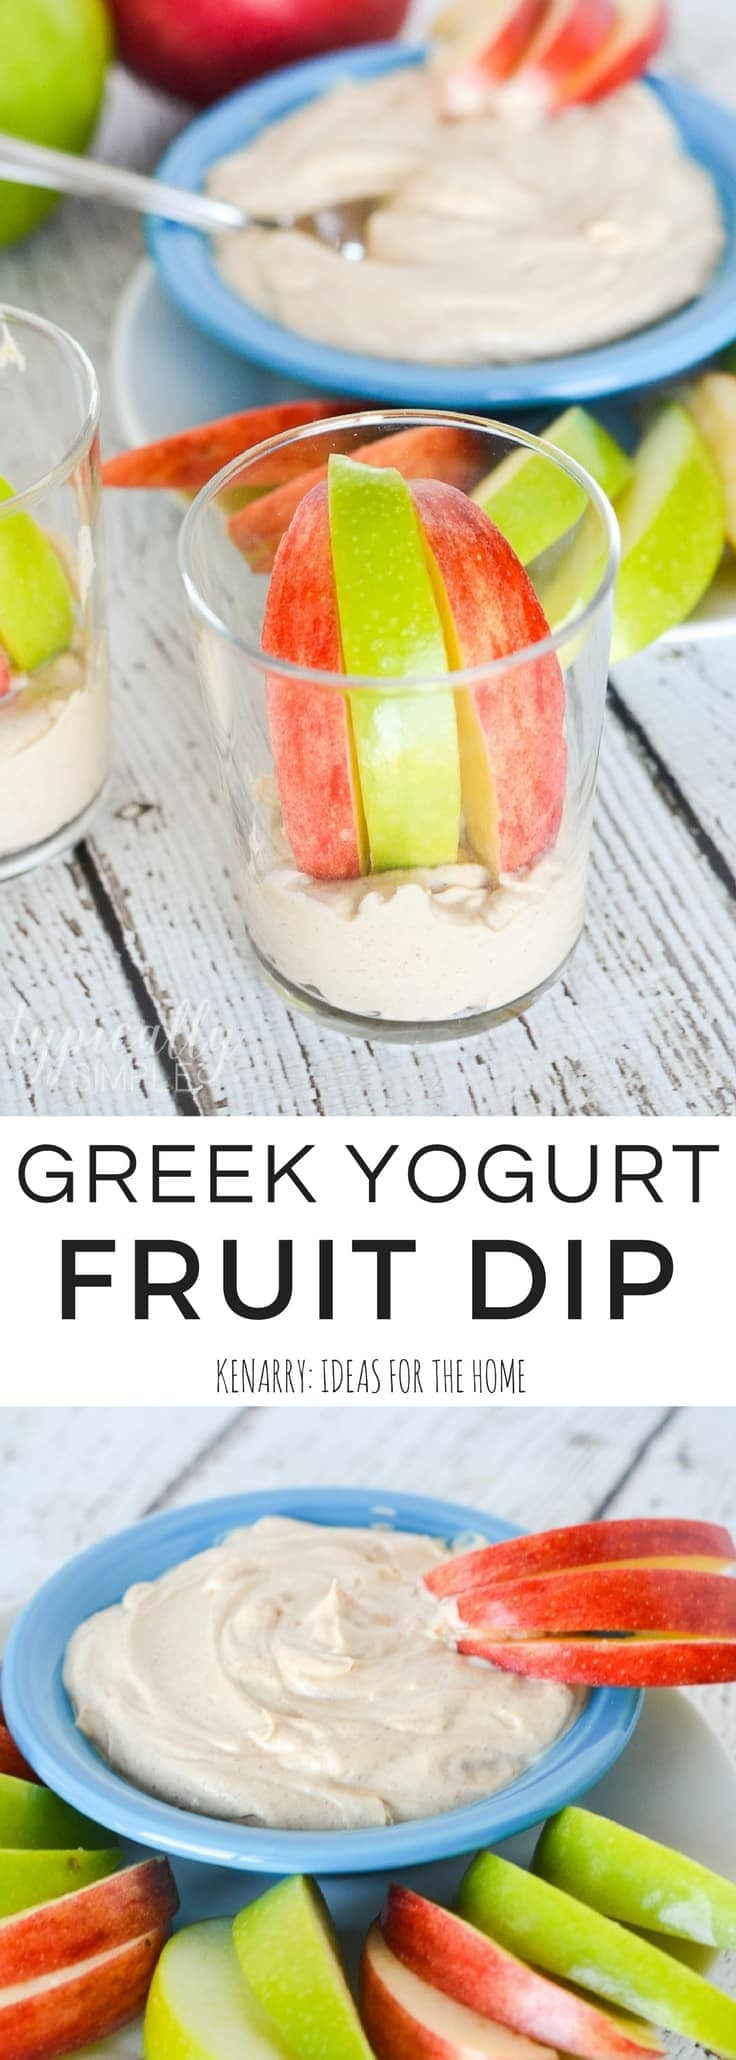 Greek Yogurt and Peanut Butter Fruit Dip Recipe for Summer